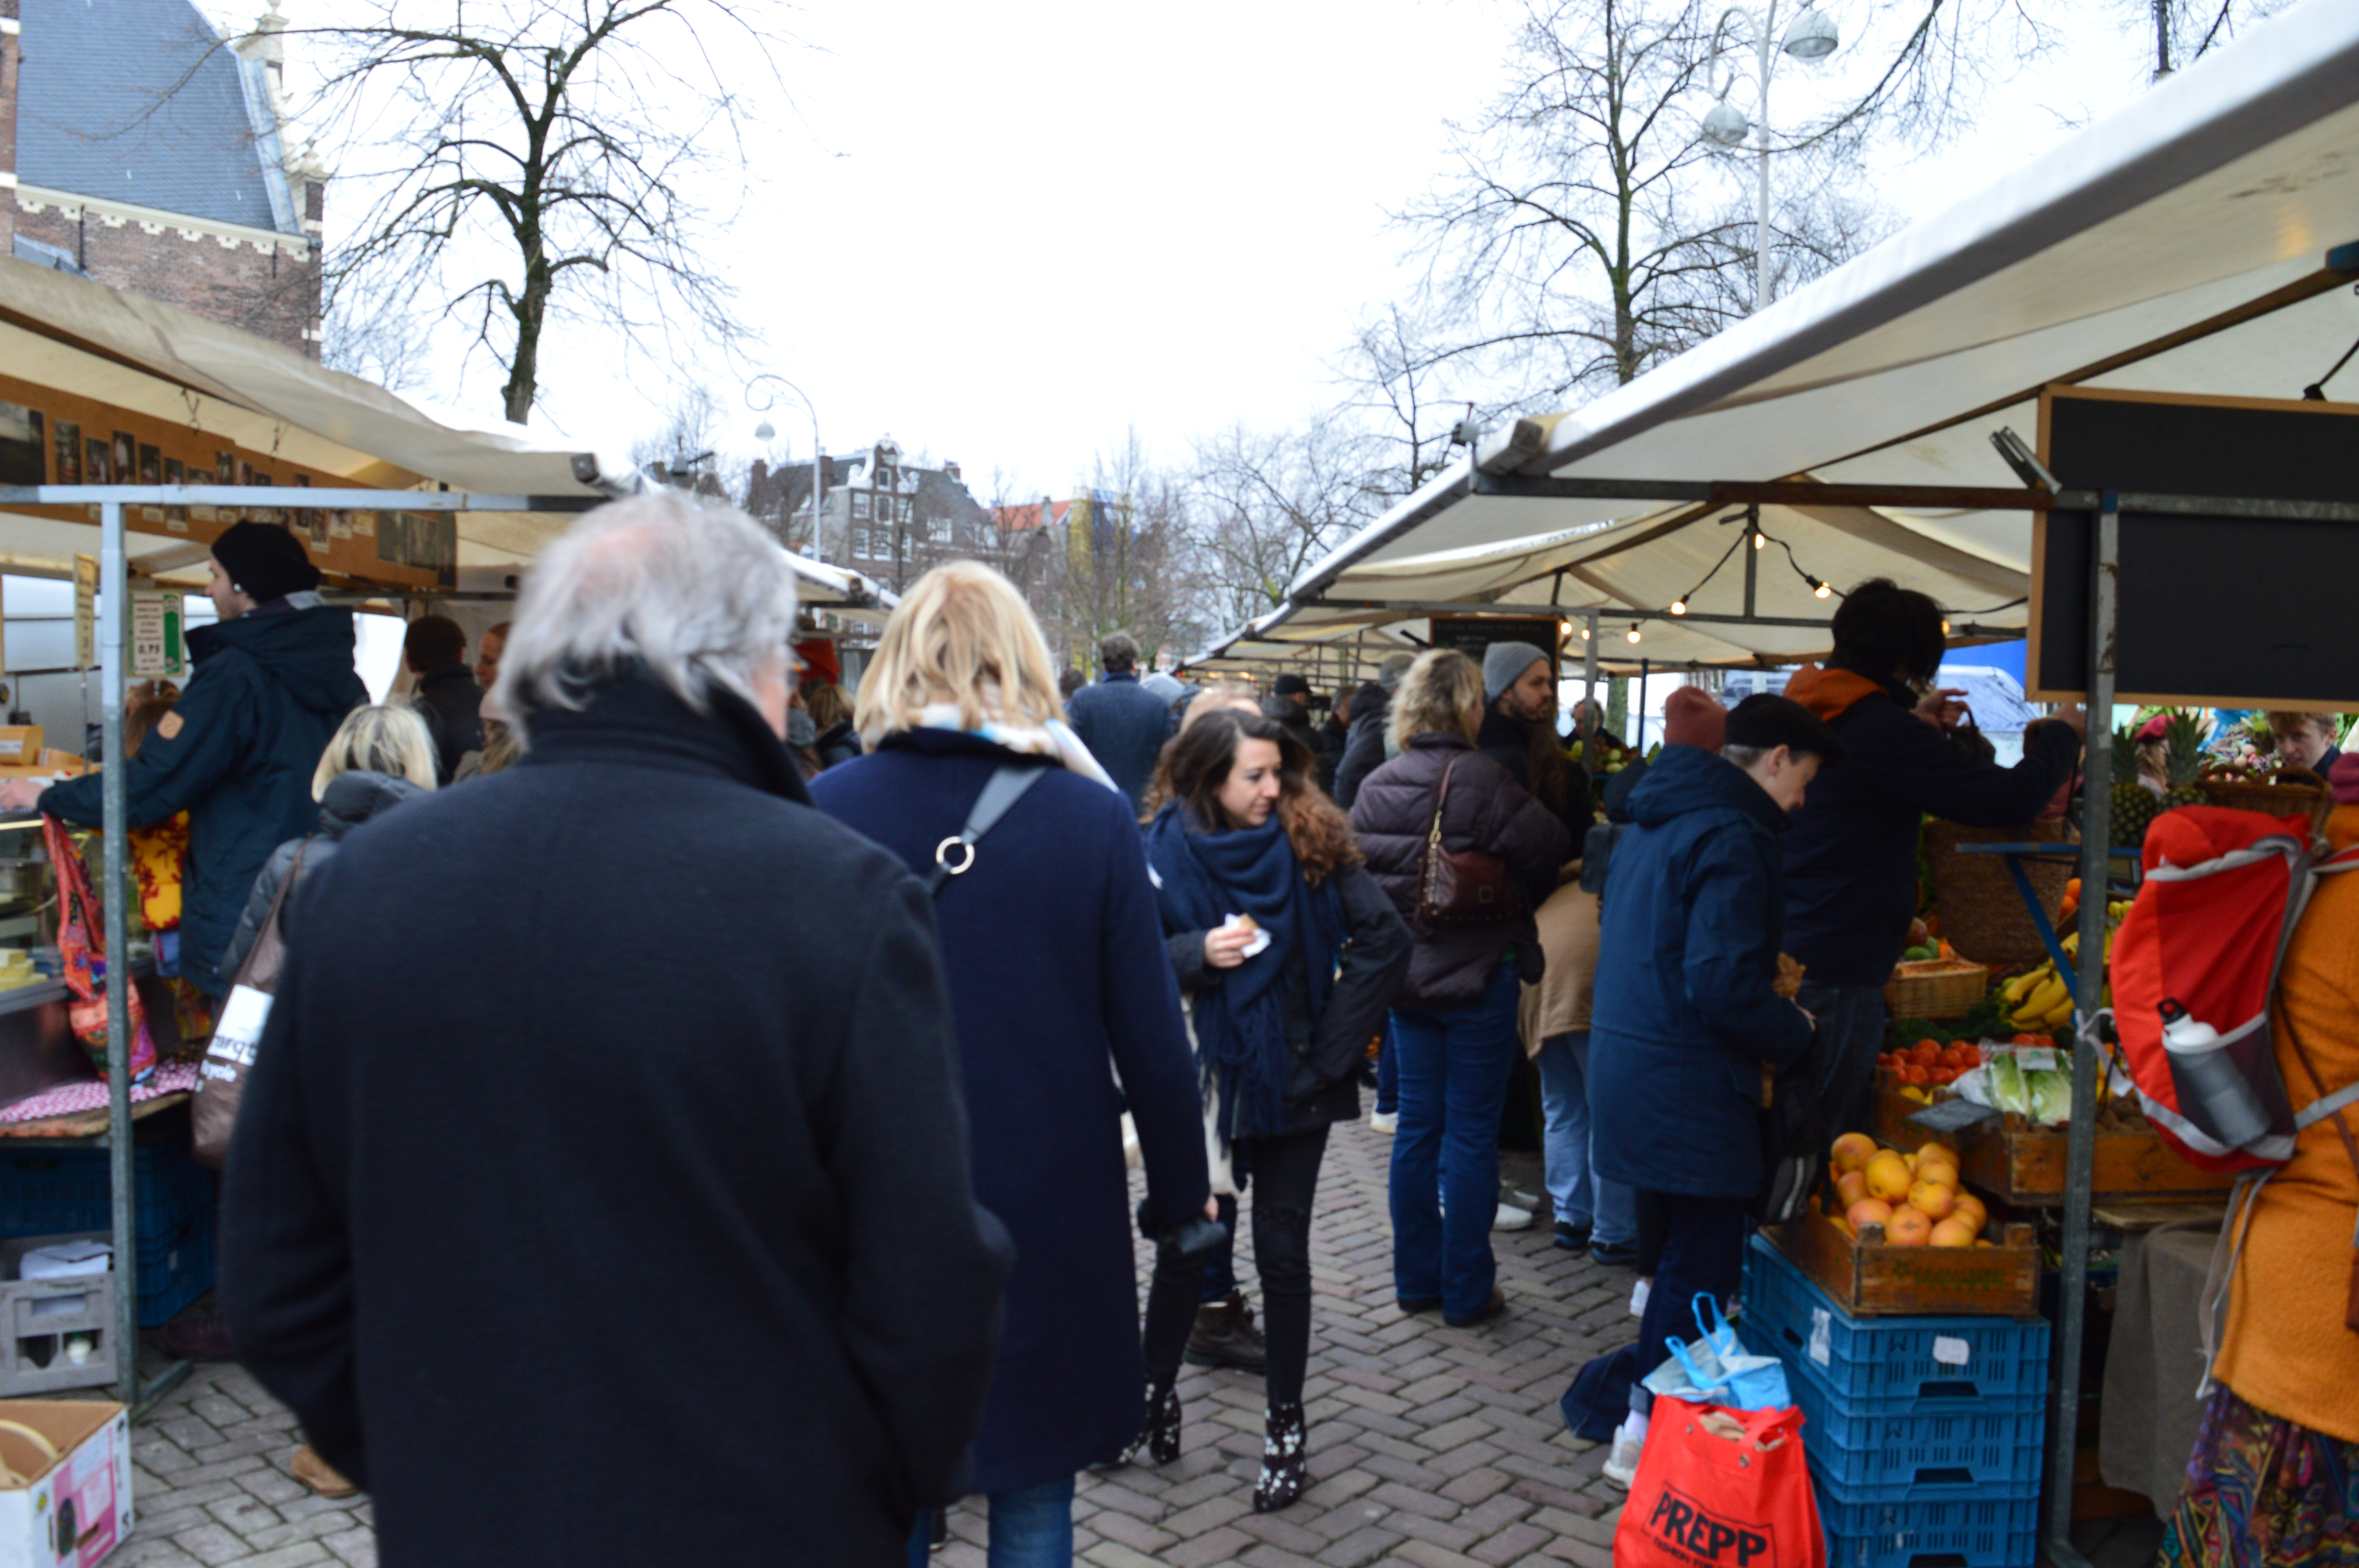 busy weekend market filled with people in Jordaan in amsterdam